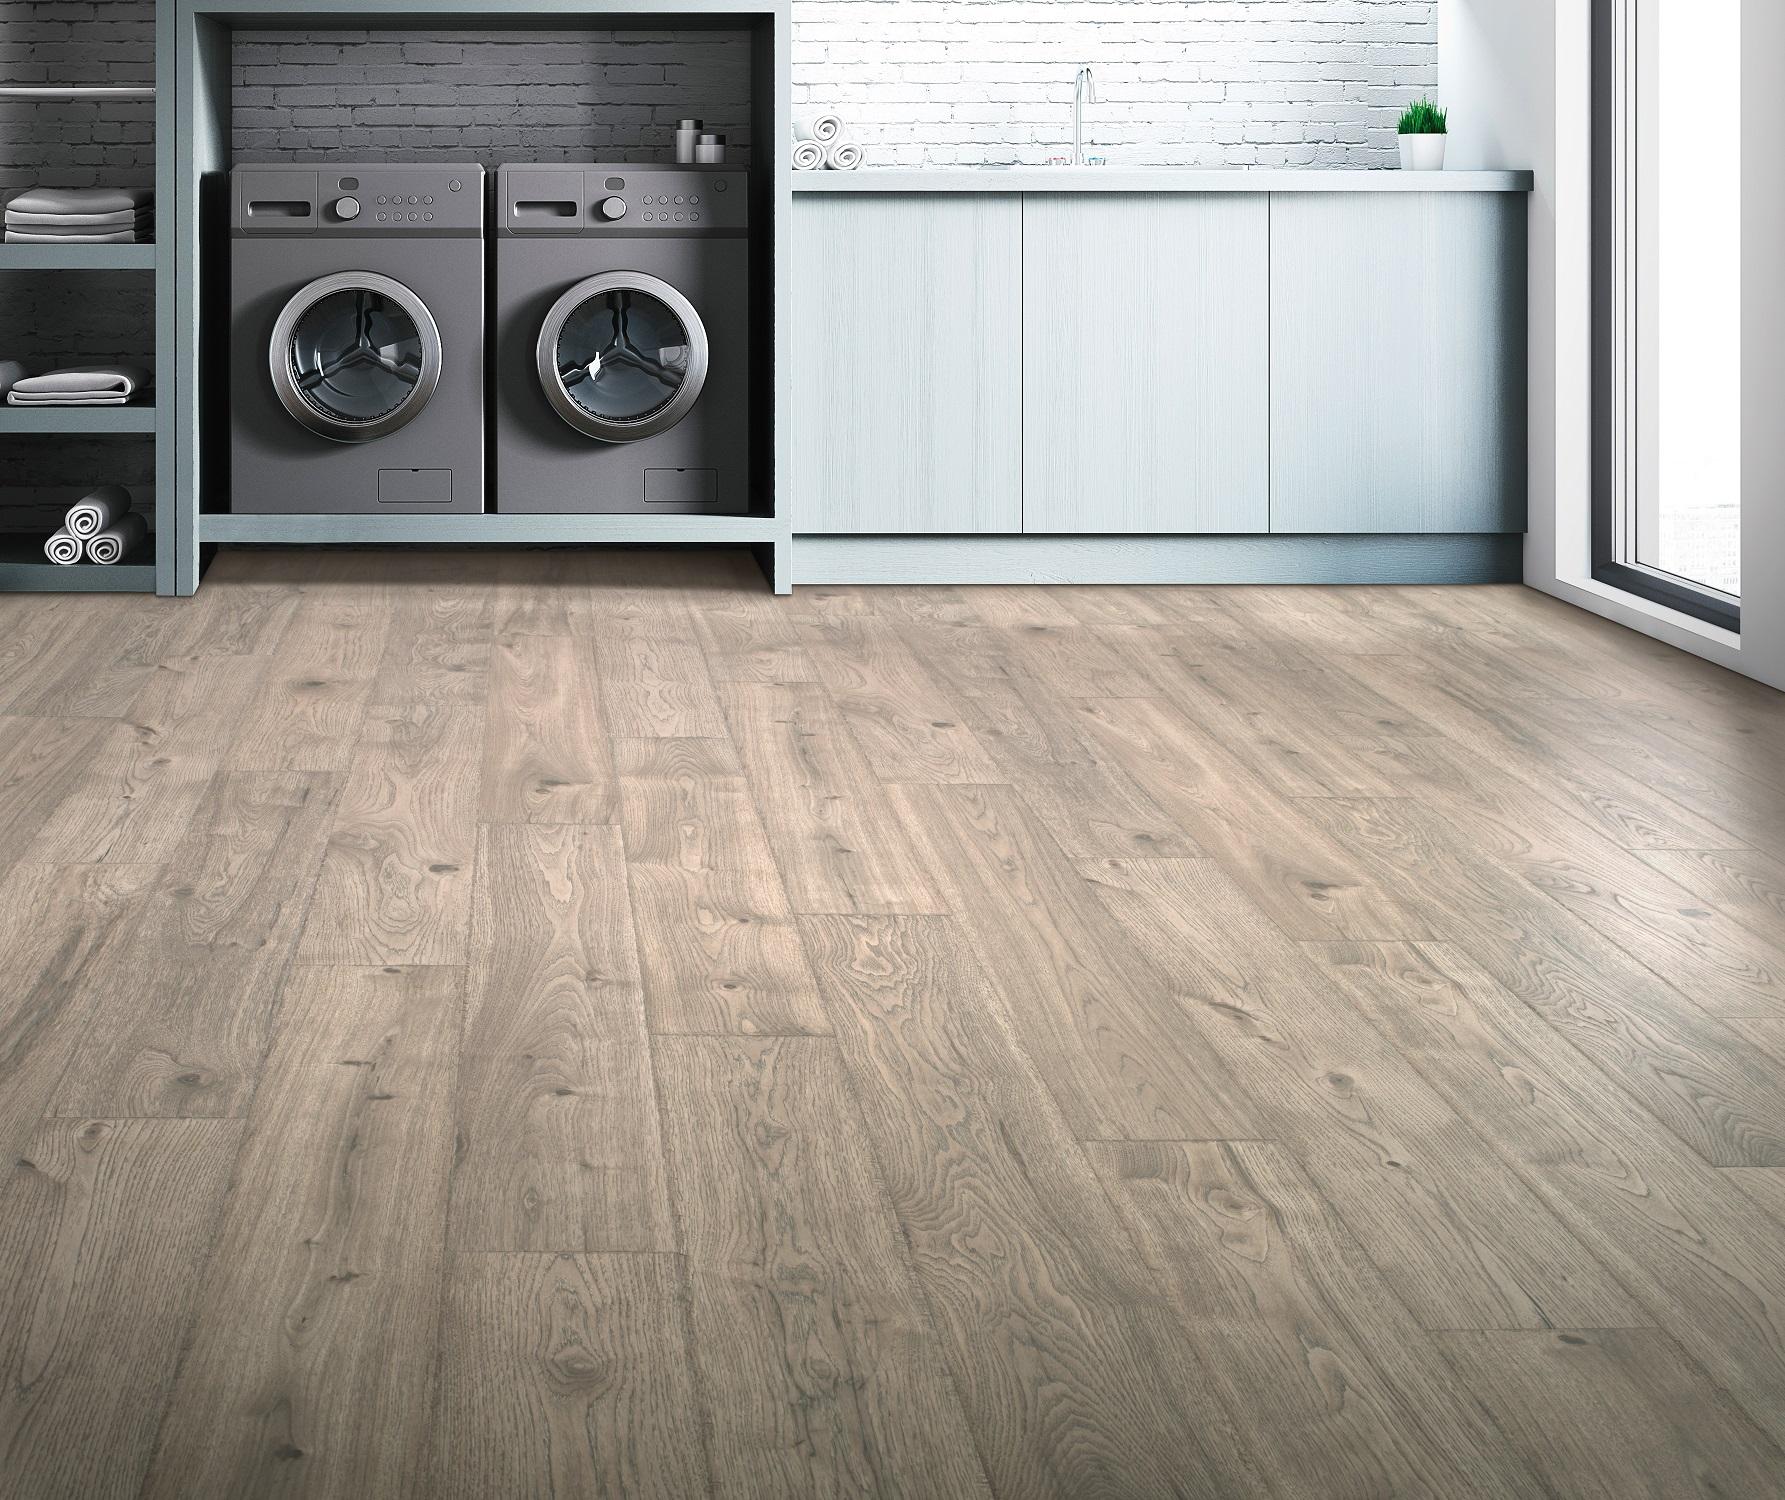 Waterproof laminate flooring in a Winnipeg, MB laundry room